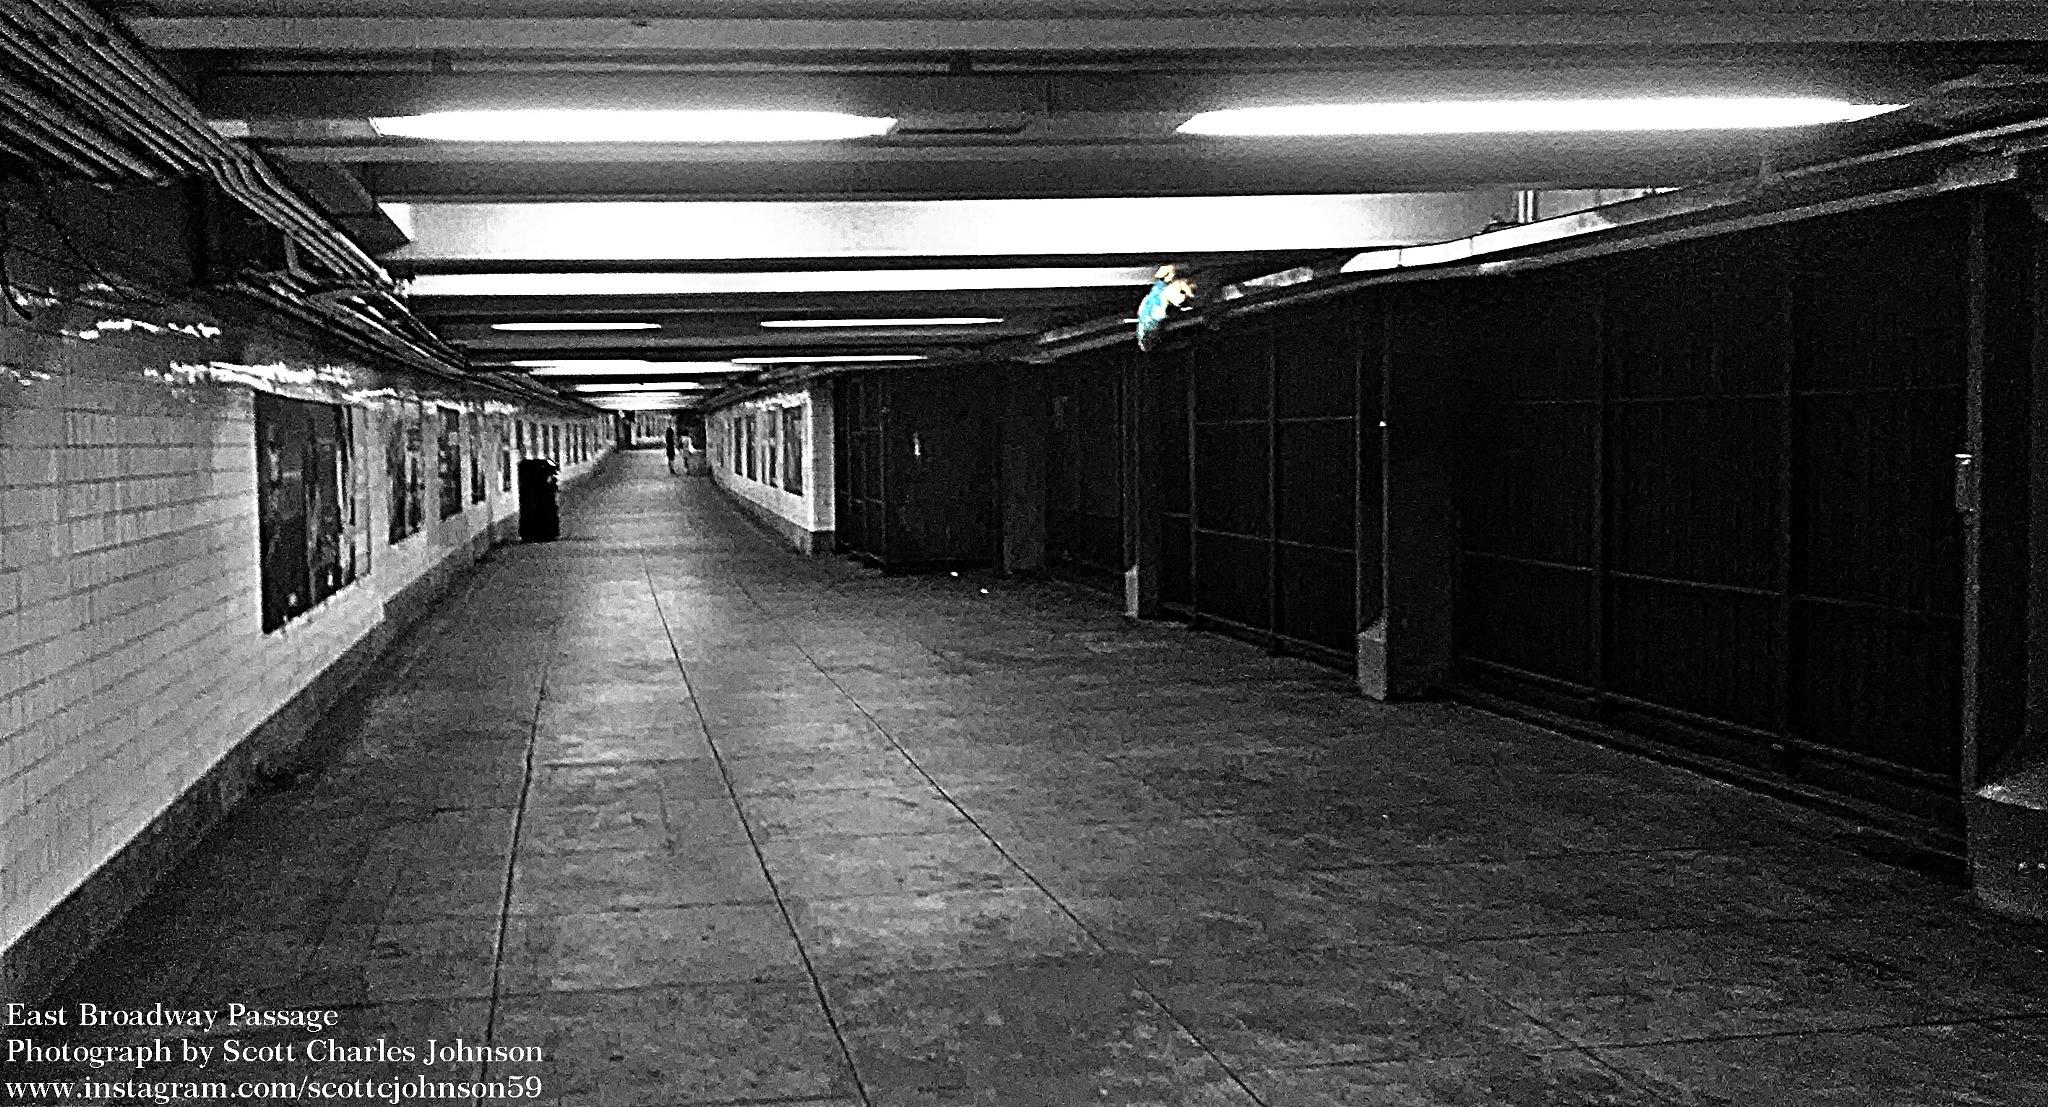 East Broadway Subway passage by Scott Charles Johnson